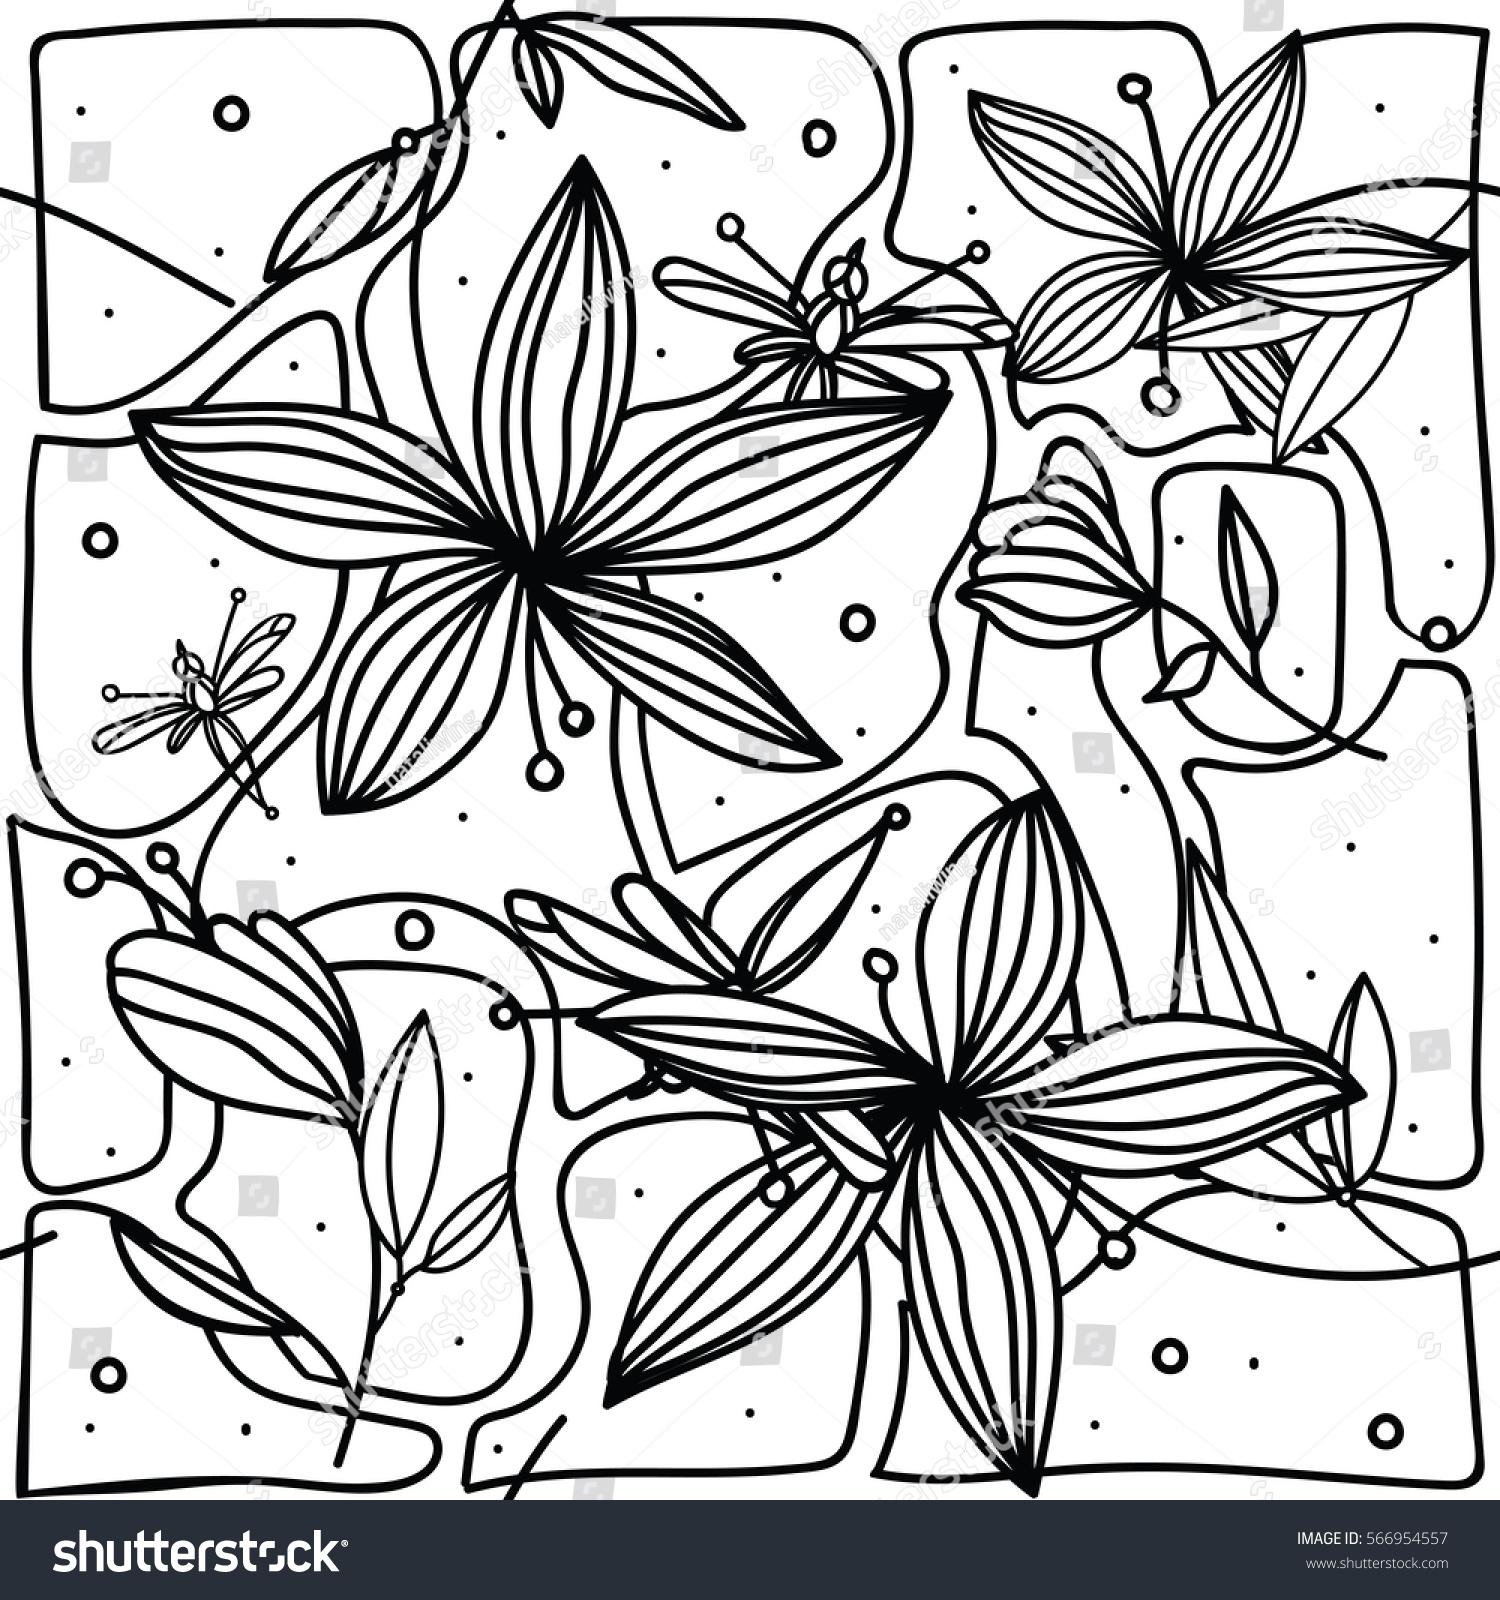 Handdrawing seamless pattern flower lily dragonfly stock vector hand drawing seamless pattern with flower lily and dragonfly on white background izmirmasajfo